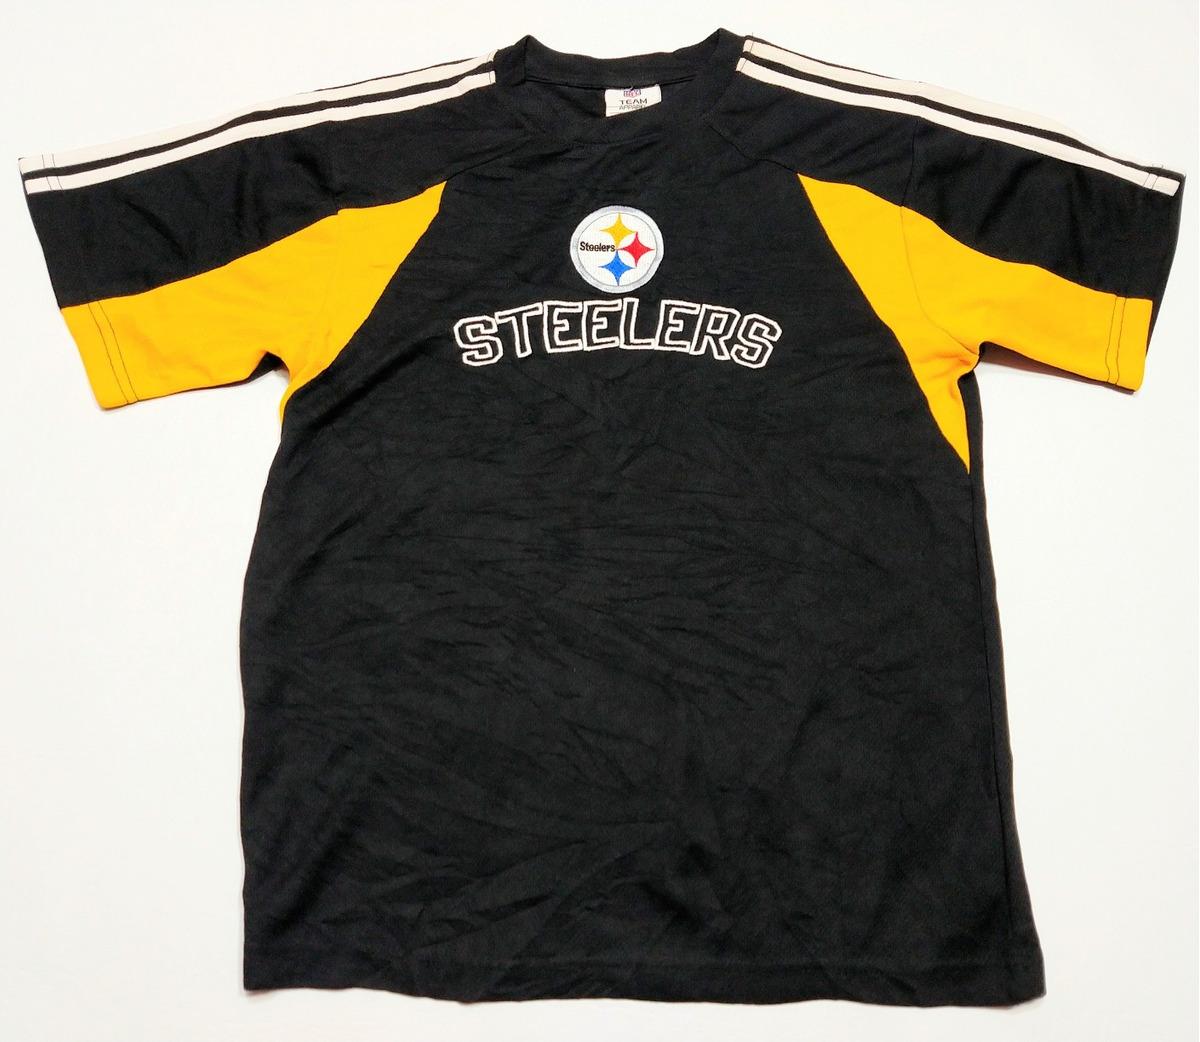 e299518a6e552 Remera Pittsburgh Steelers Nfl Talle Xl Juvenil 14-16 -   750